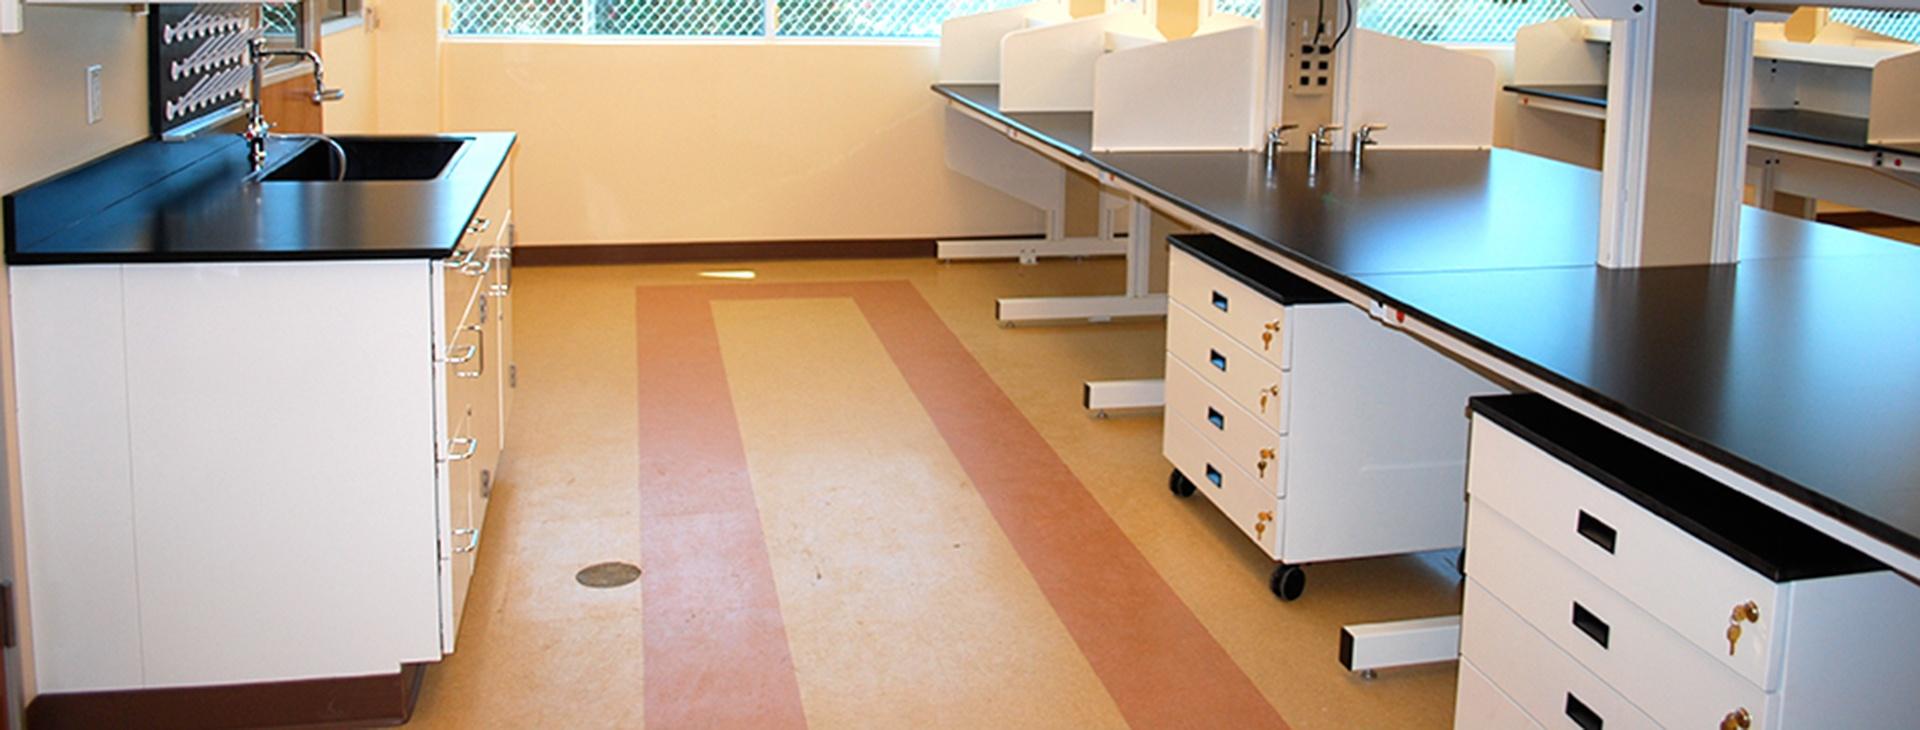 C2-Lab-benches.jpg